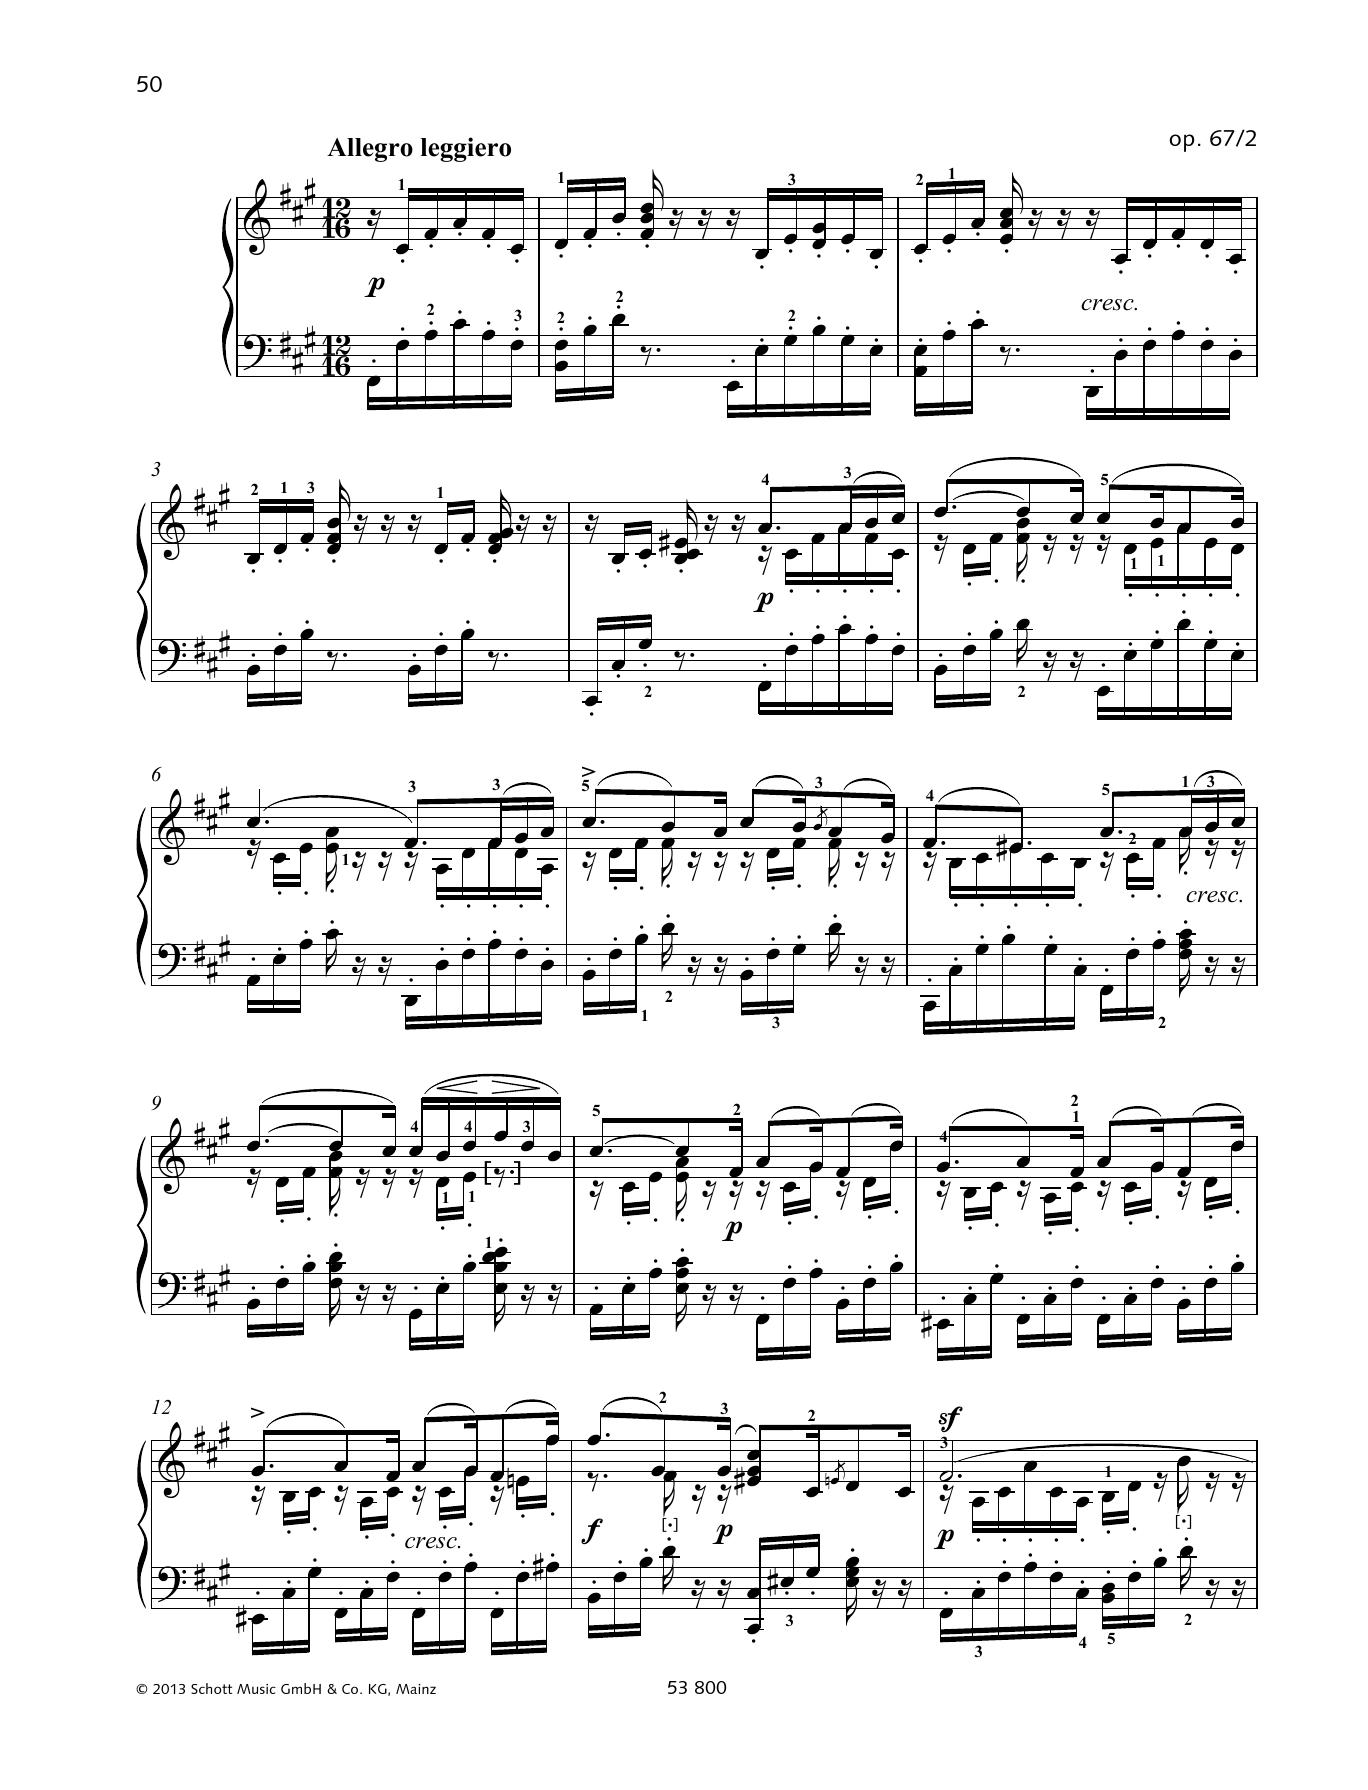 Felix Mendelssohn Bartholdy Allegro leggiero sheet music notes and chords. Download Printable PDF.